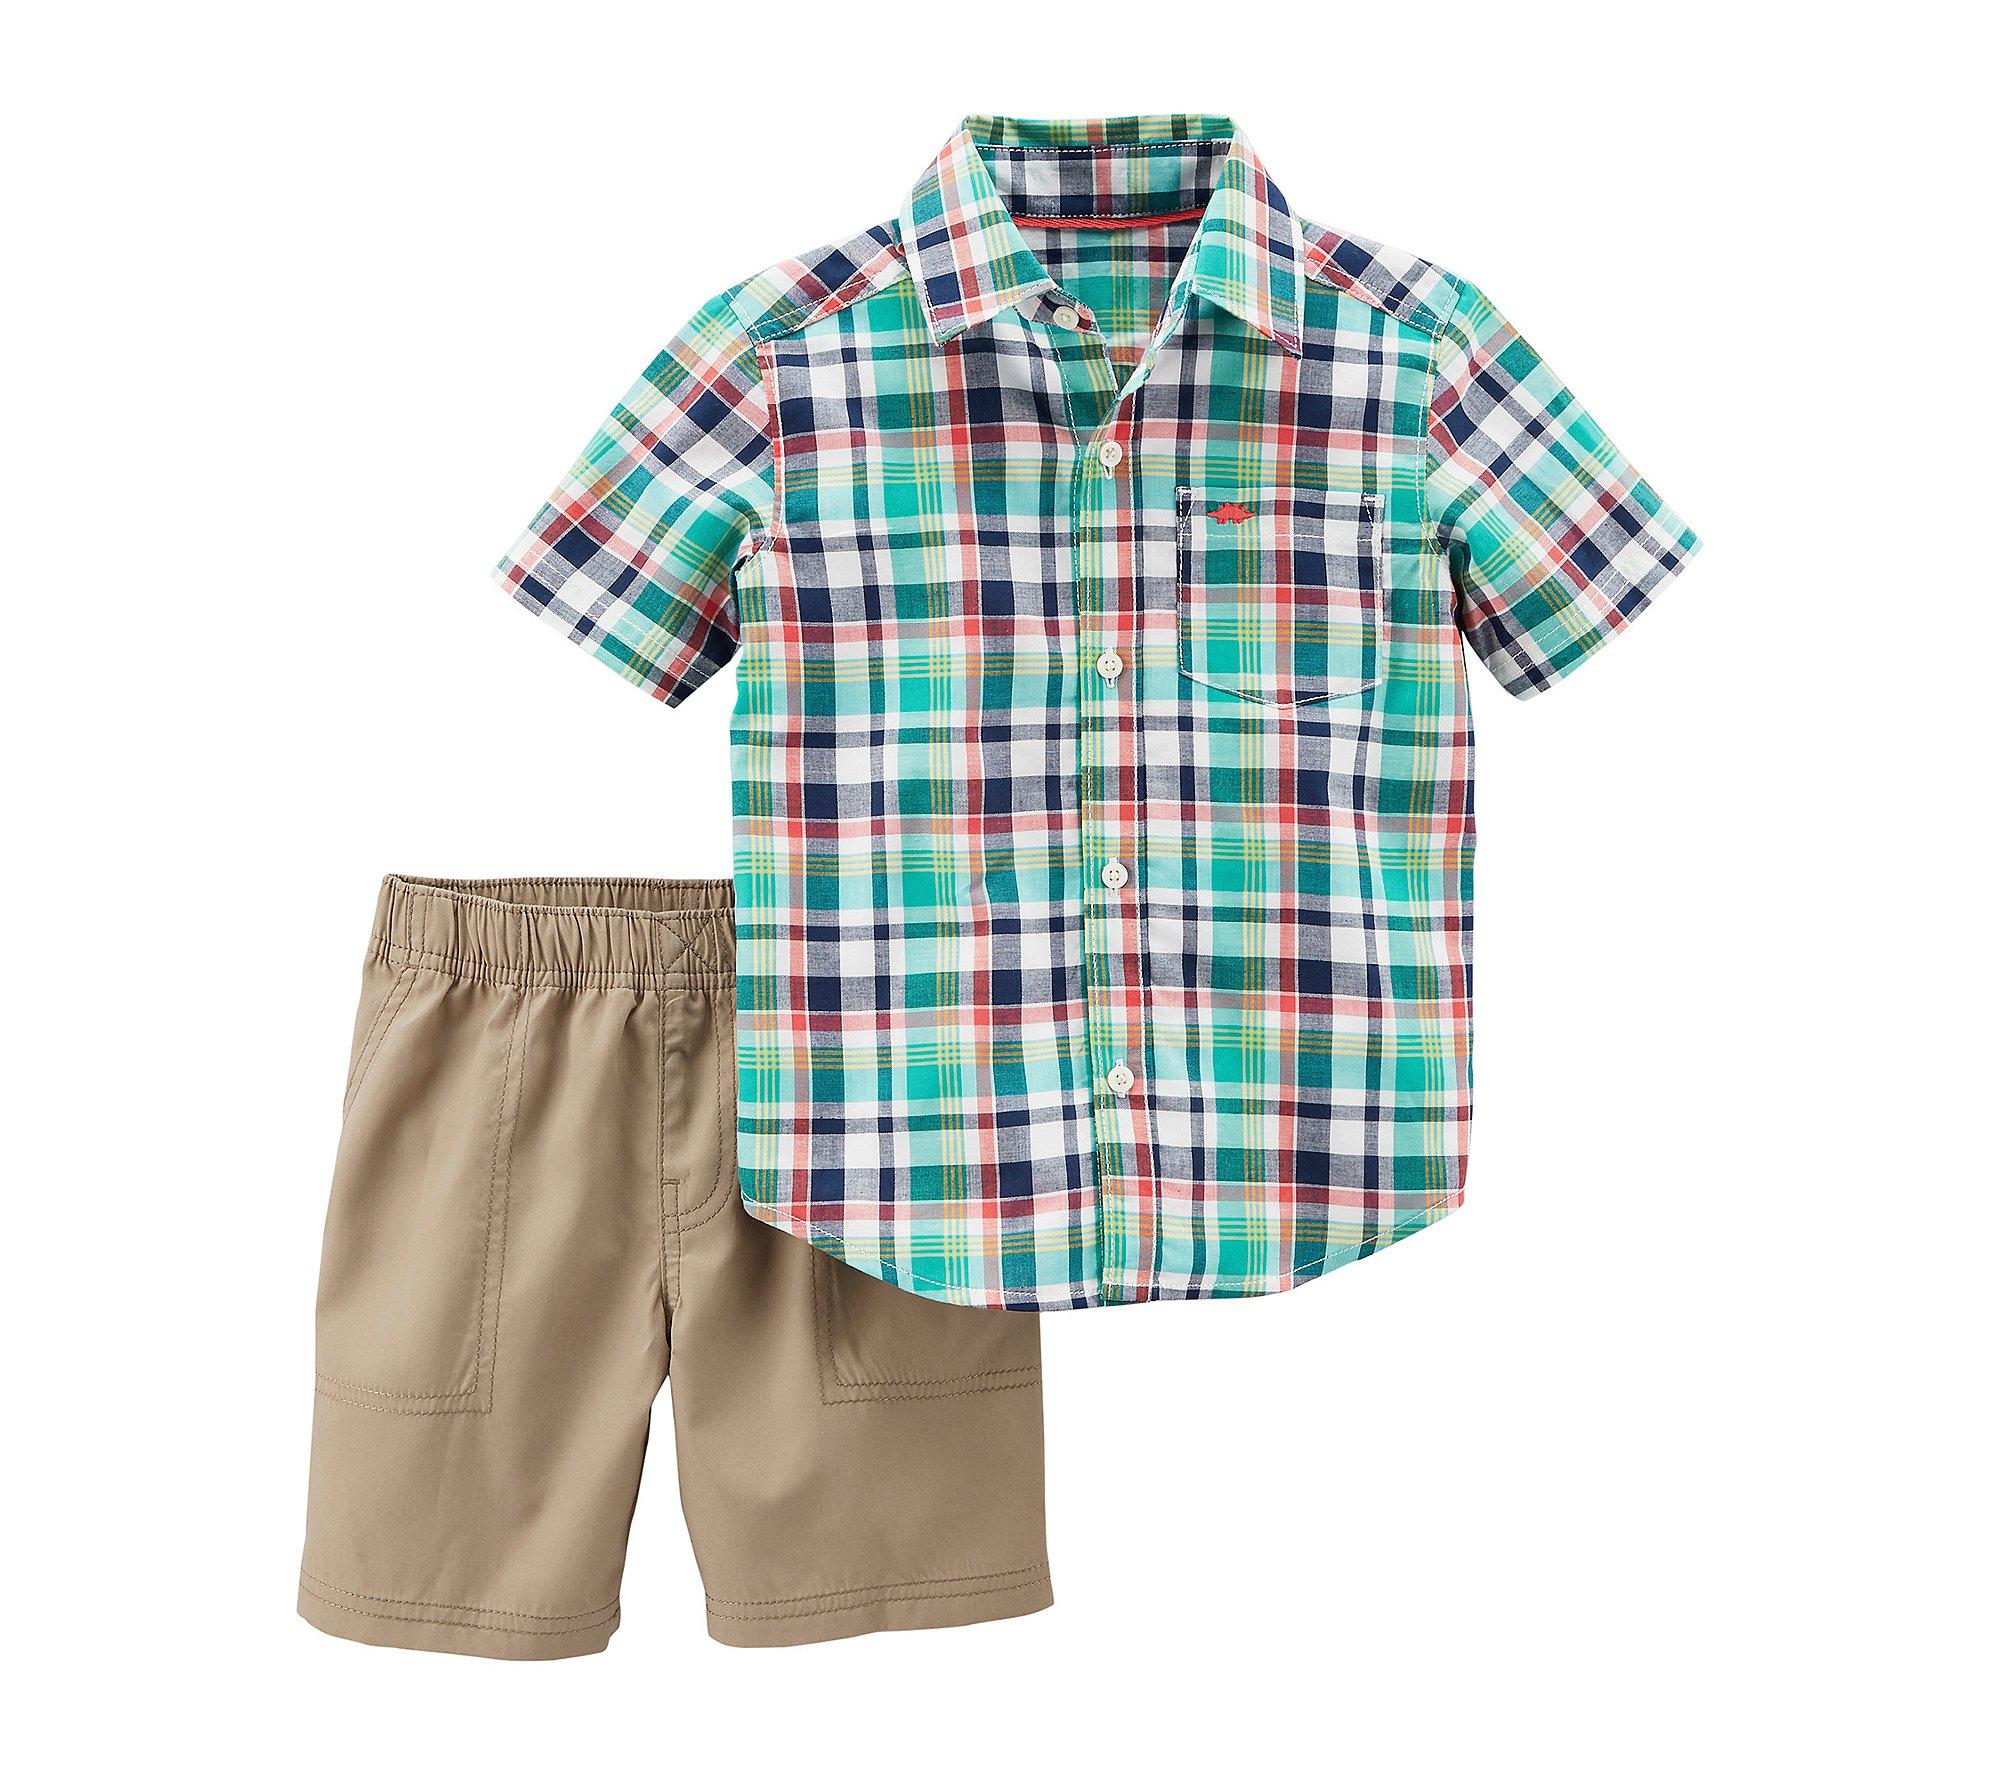 Carters Baby Boys 2 Pc Playwear Sets 249g396